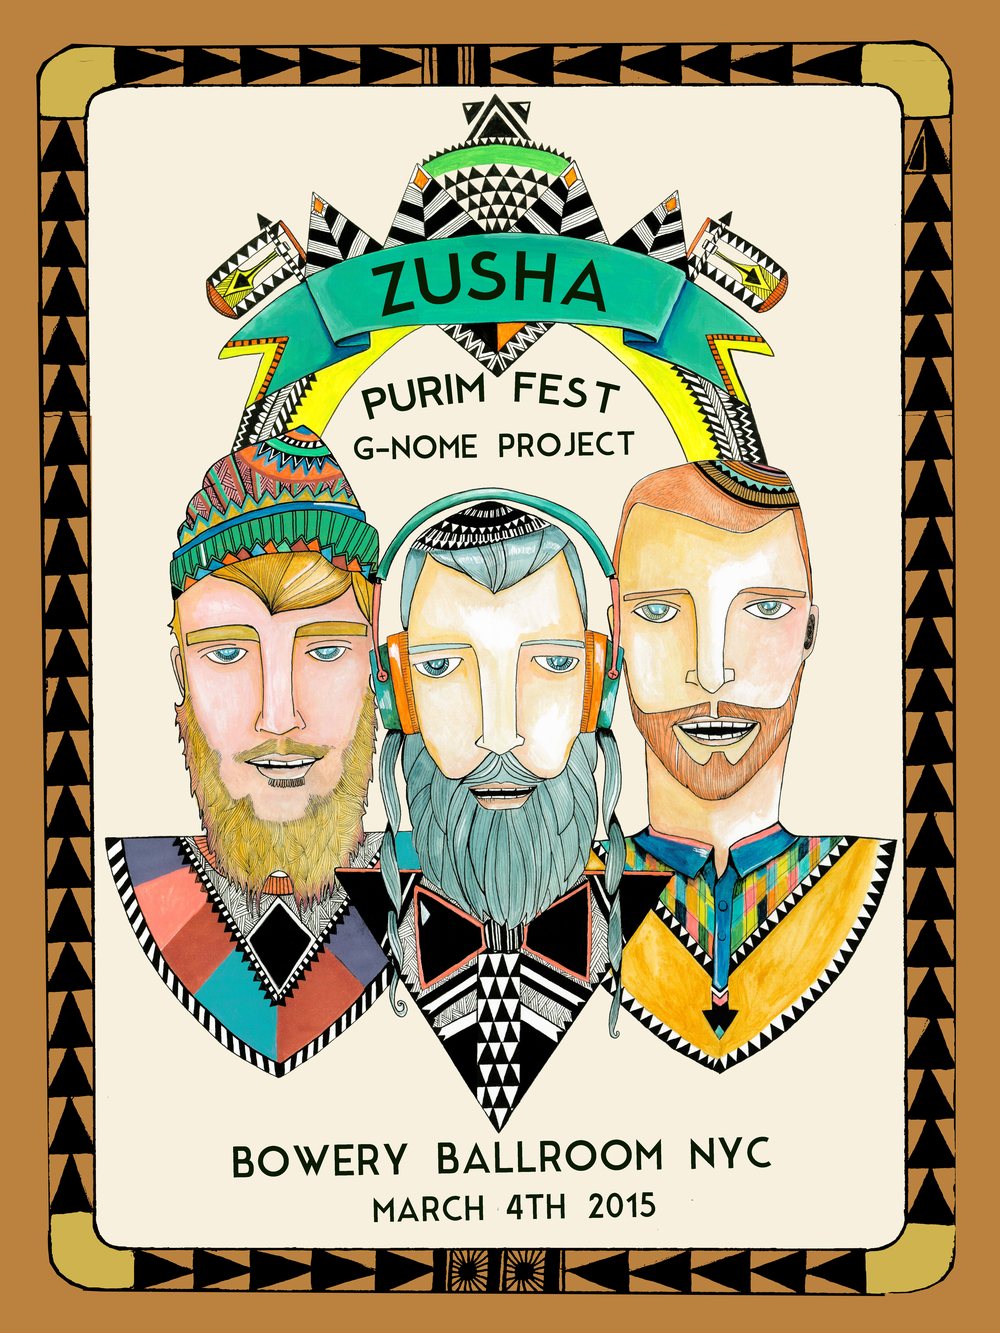 ZUSHA Purim fest-3.jpg